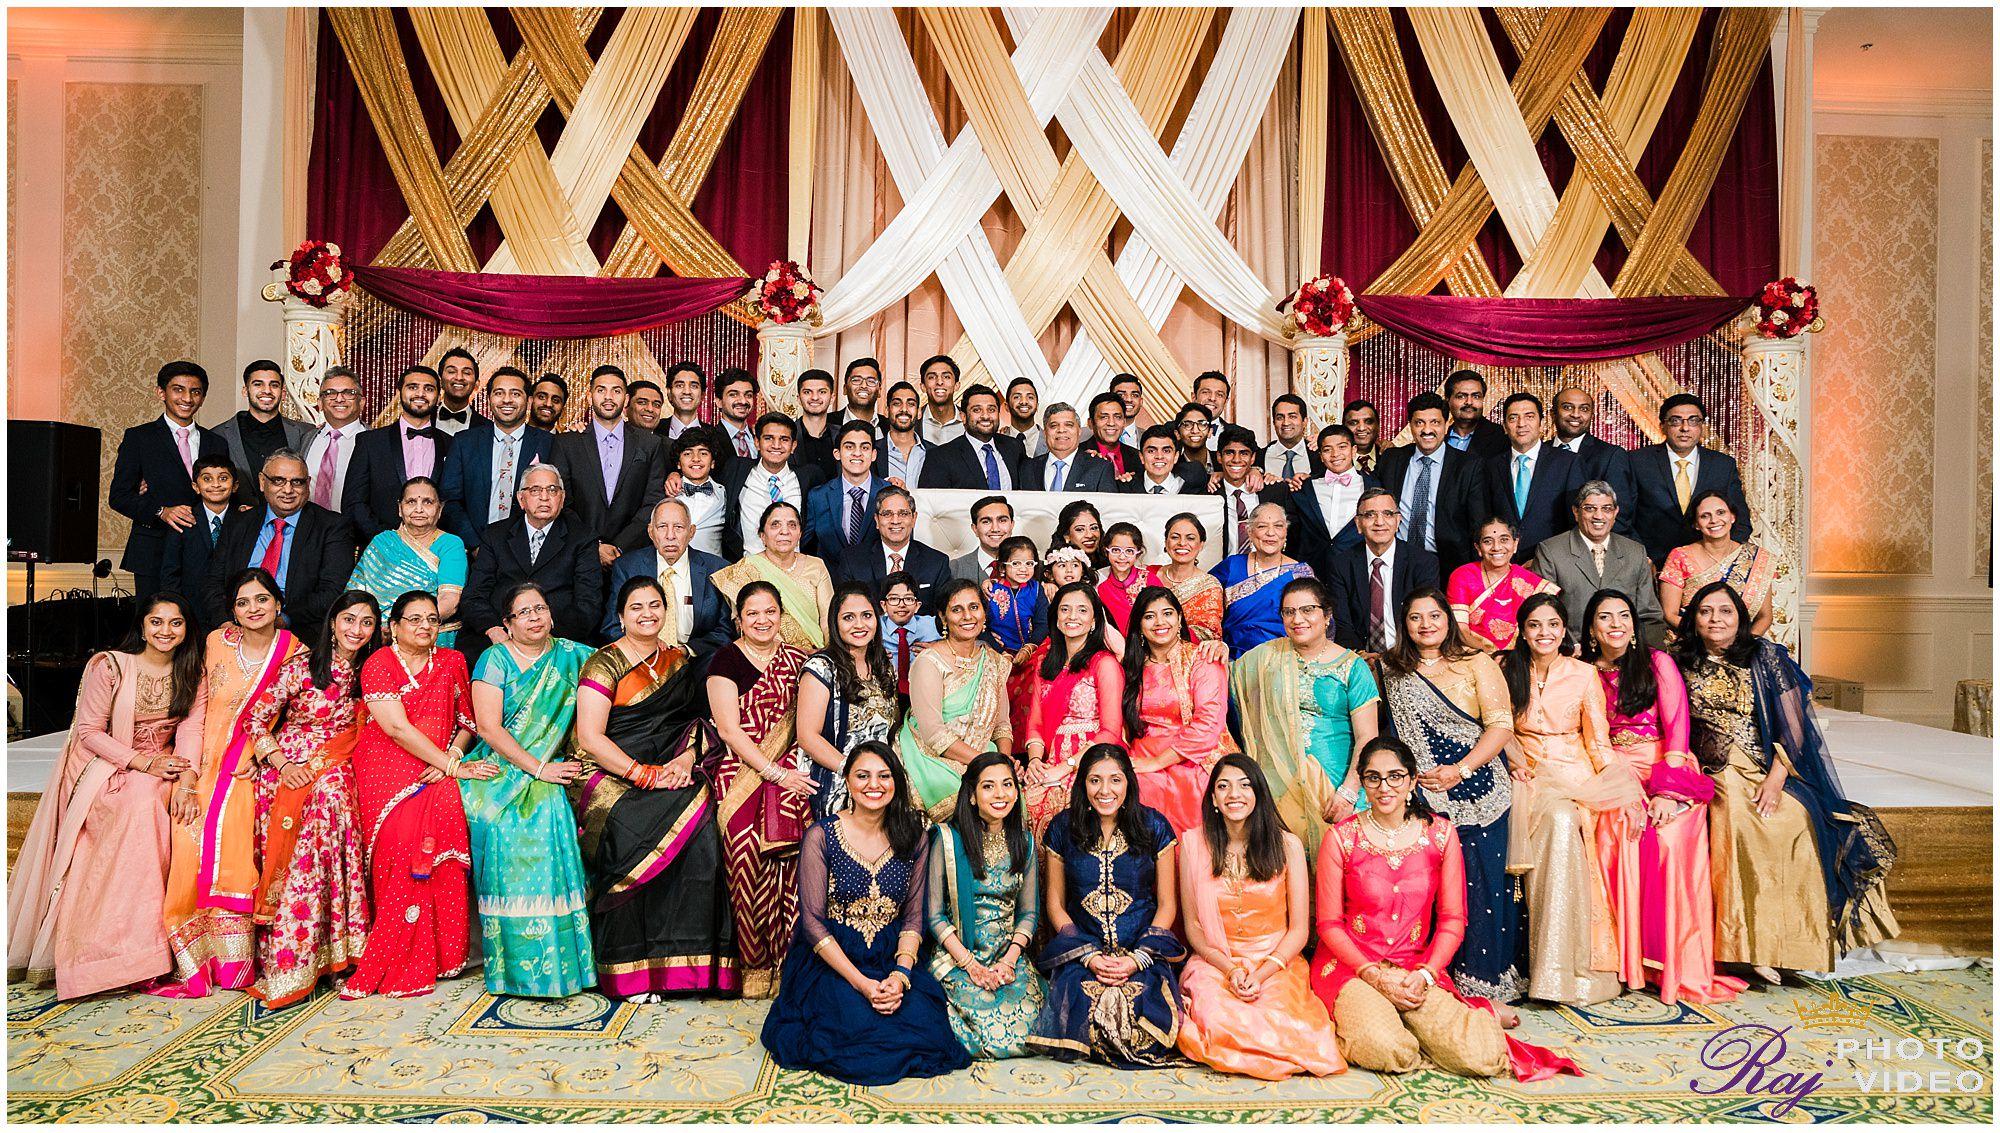 Founders-Inn-and-Spa-Virginia-Beach-VA-Indian-Wedding-Harini-Vivek-89.jpg